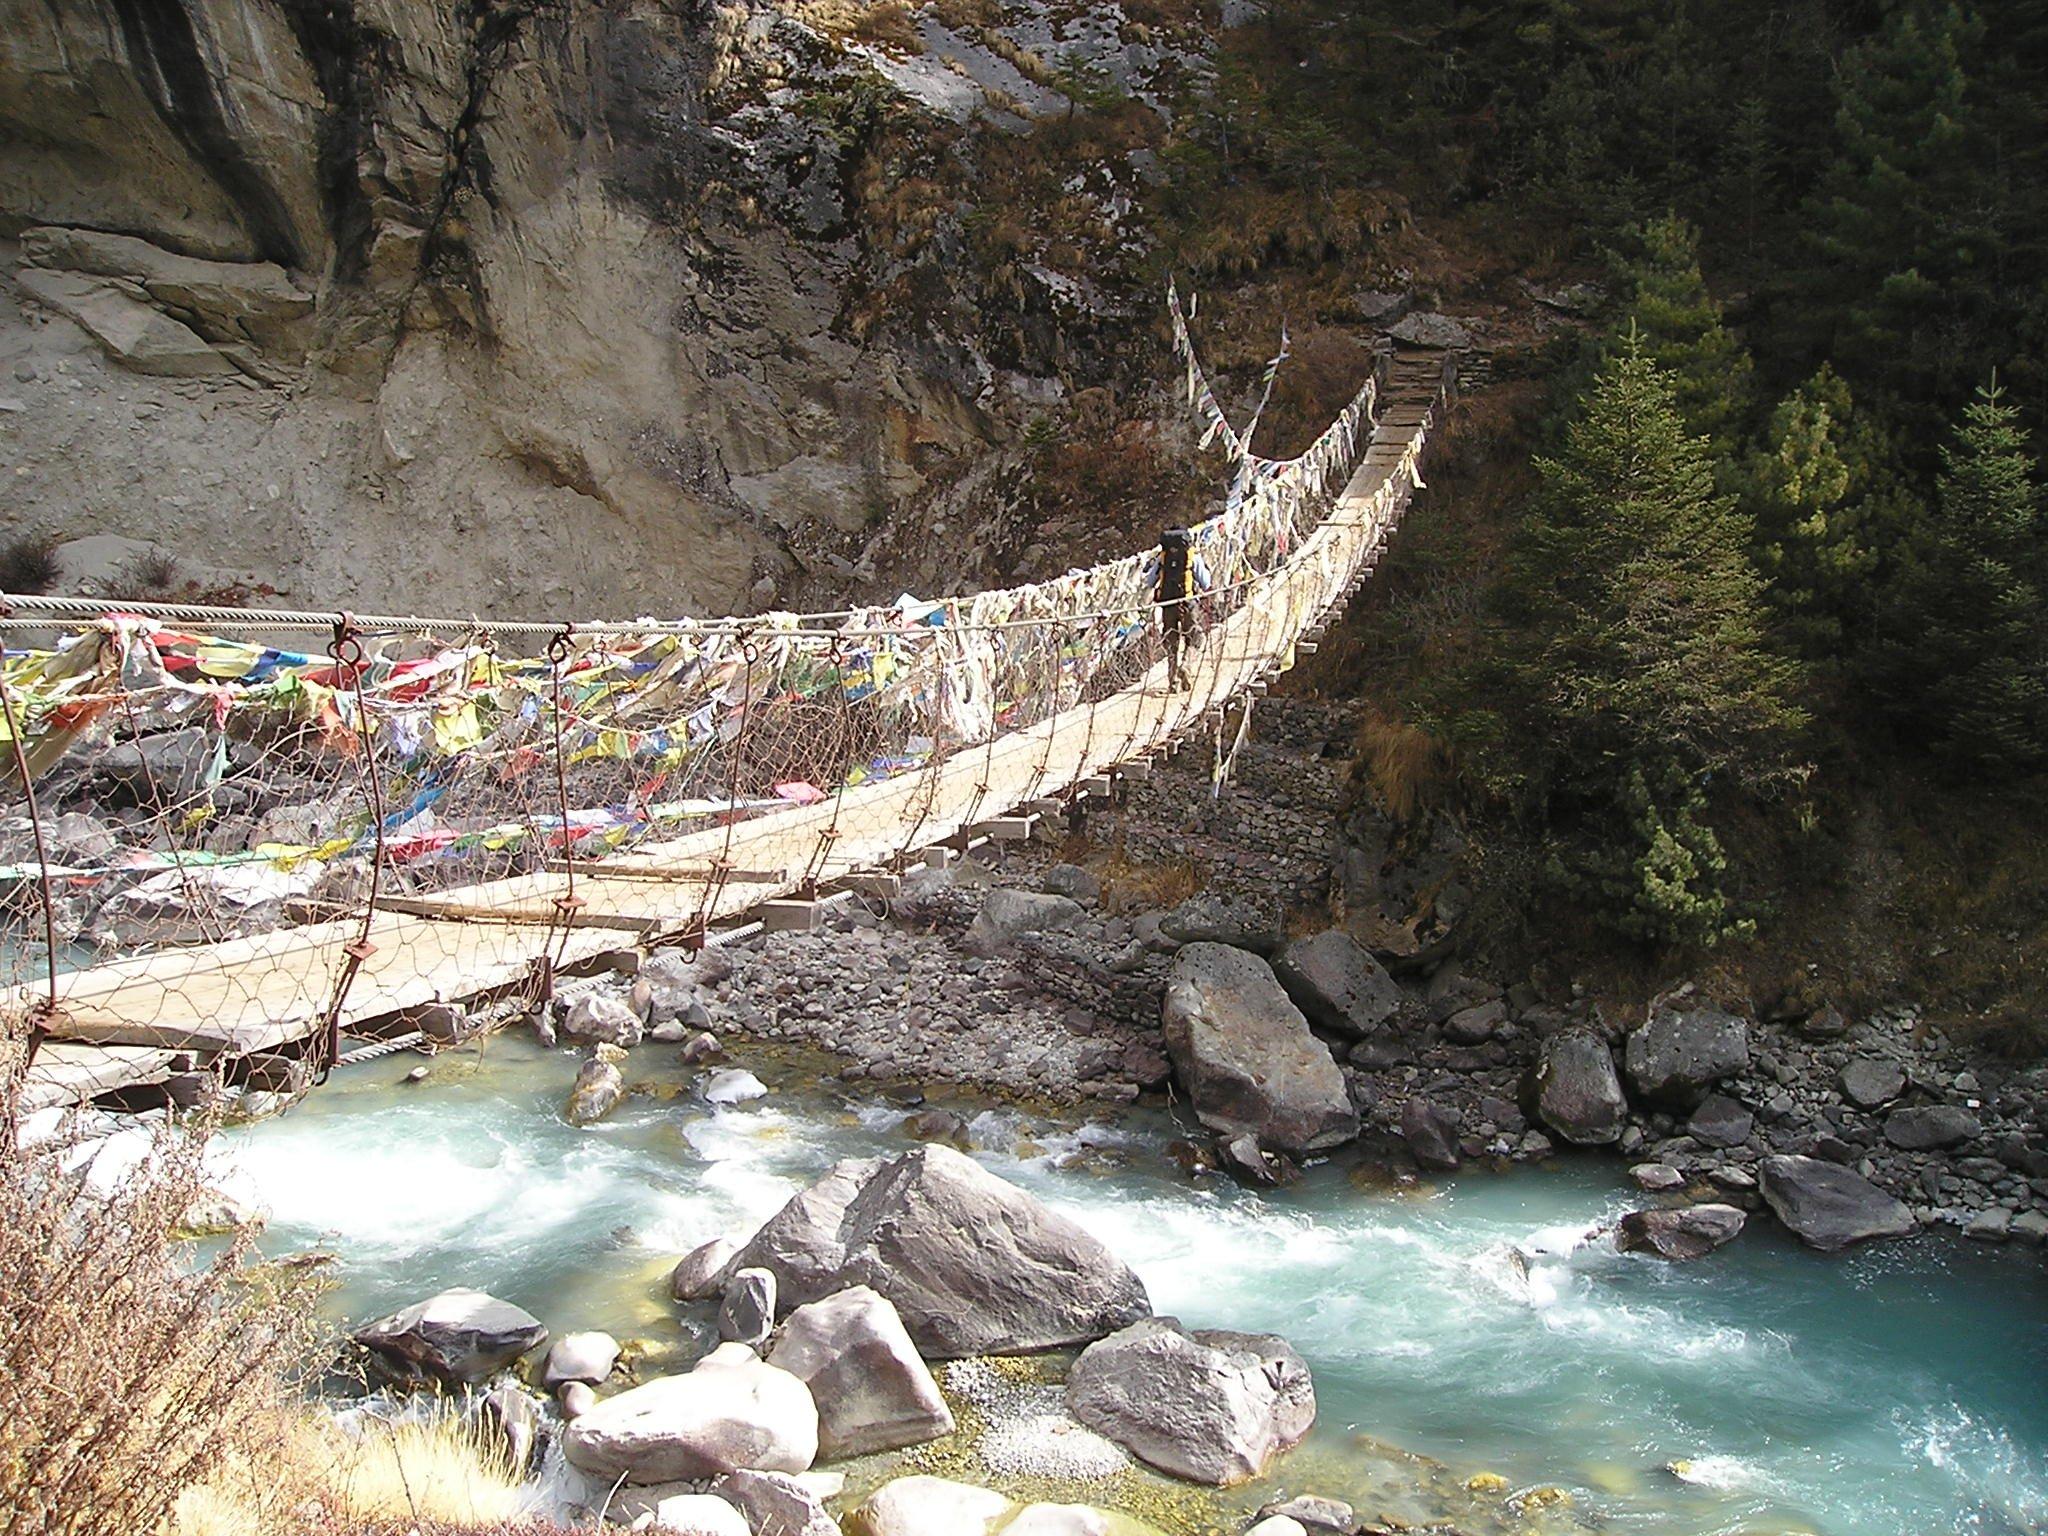 water-waterfall-wilderness-river-valley-suspension-bridge-1360908-pxhere.com